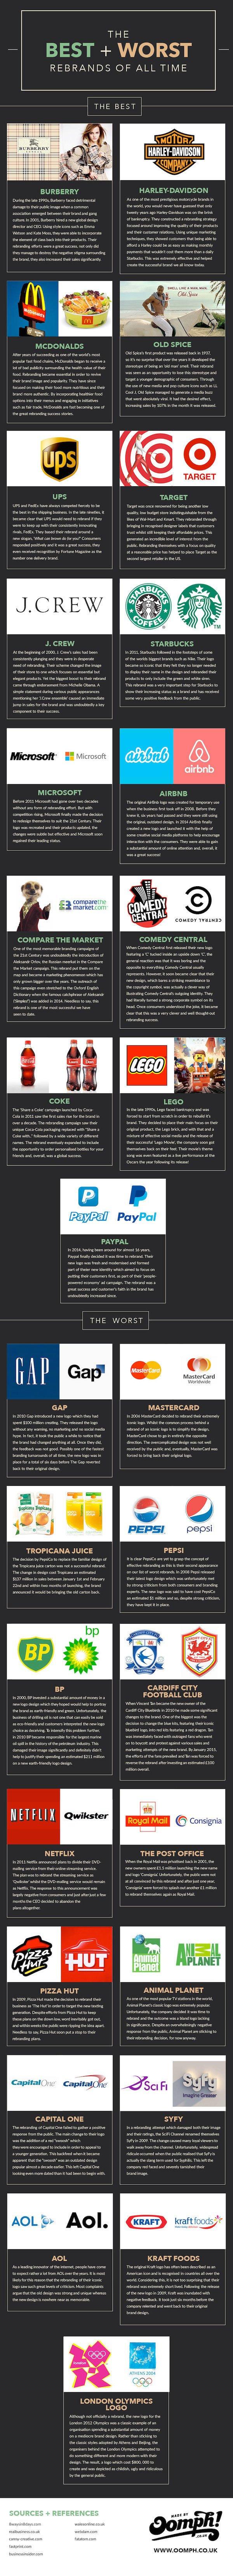 best-worst-rebrands-infographic.jpg